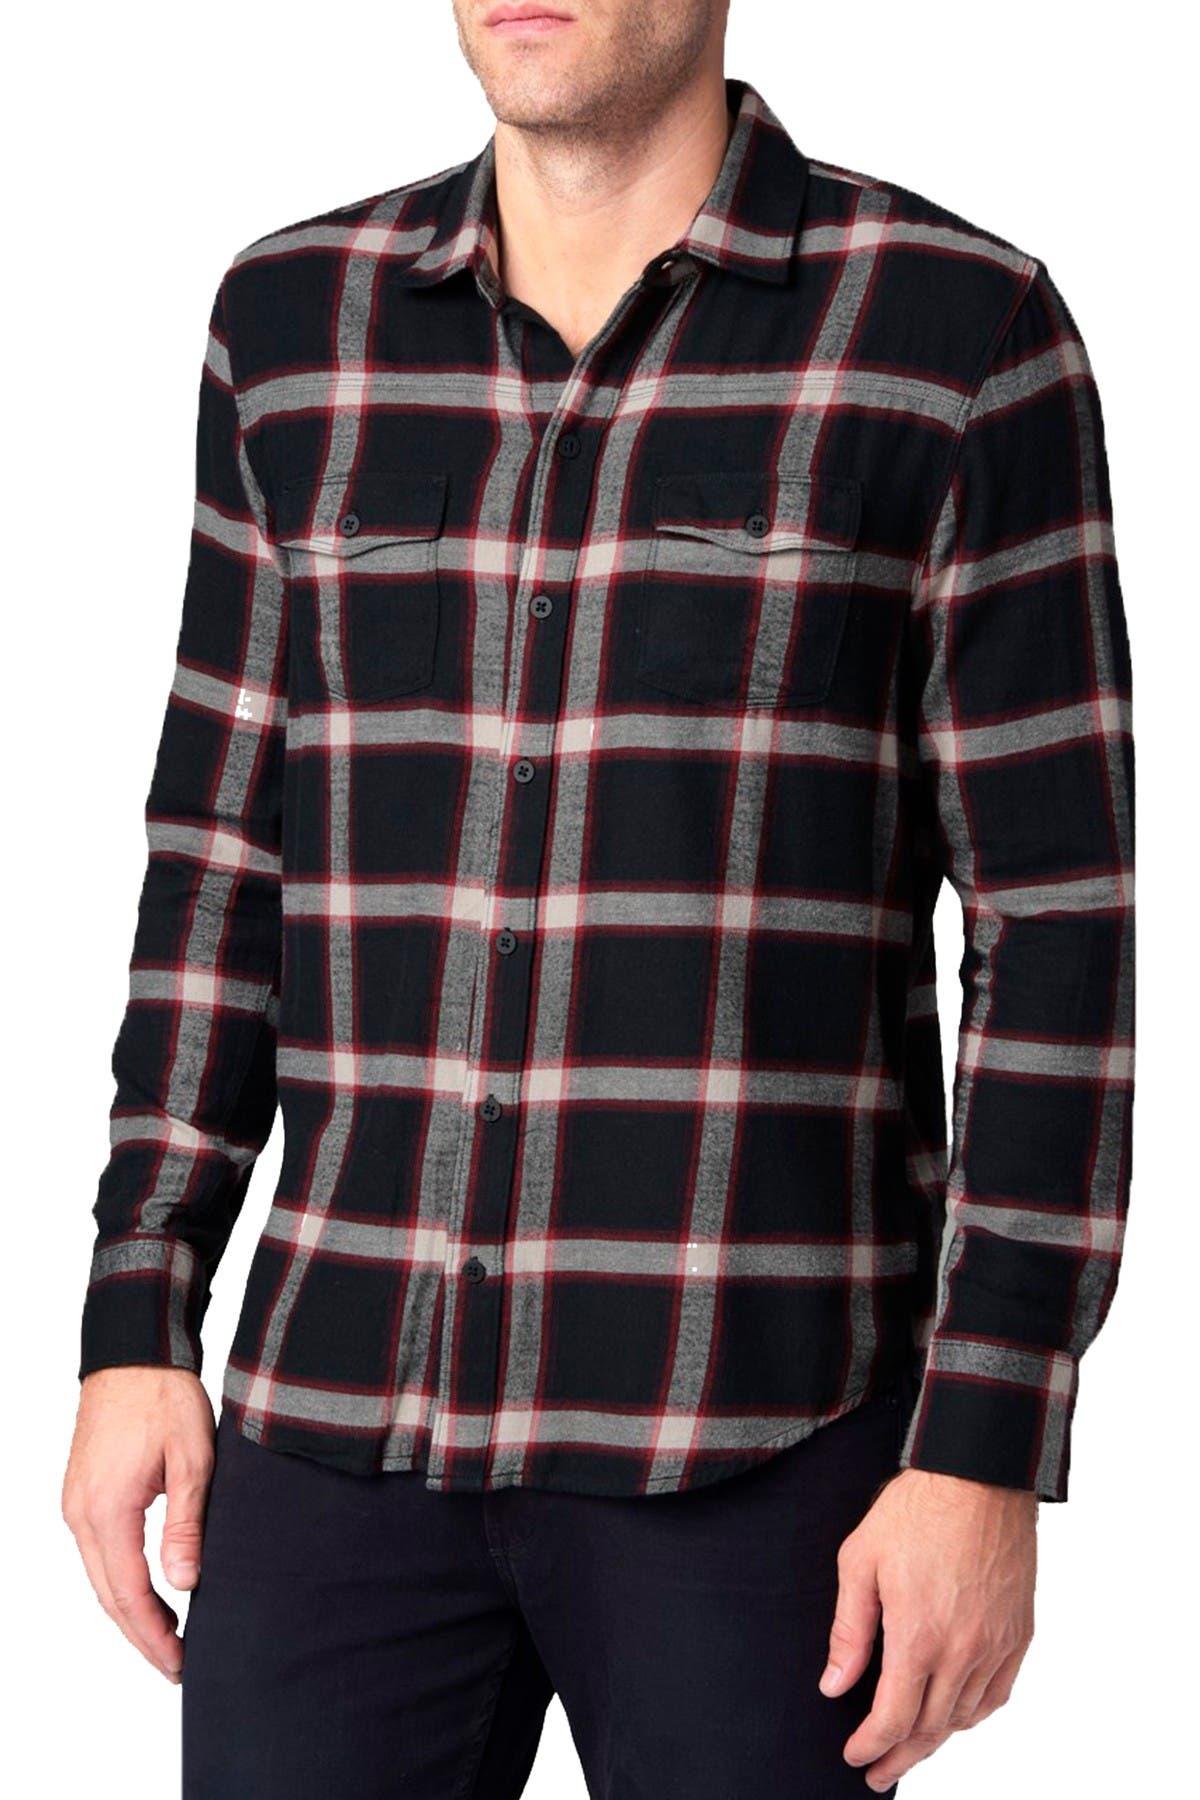 Image of PAIGE Hunter Plaid Shirt